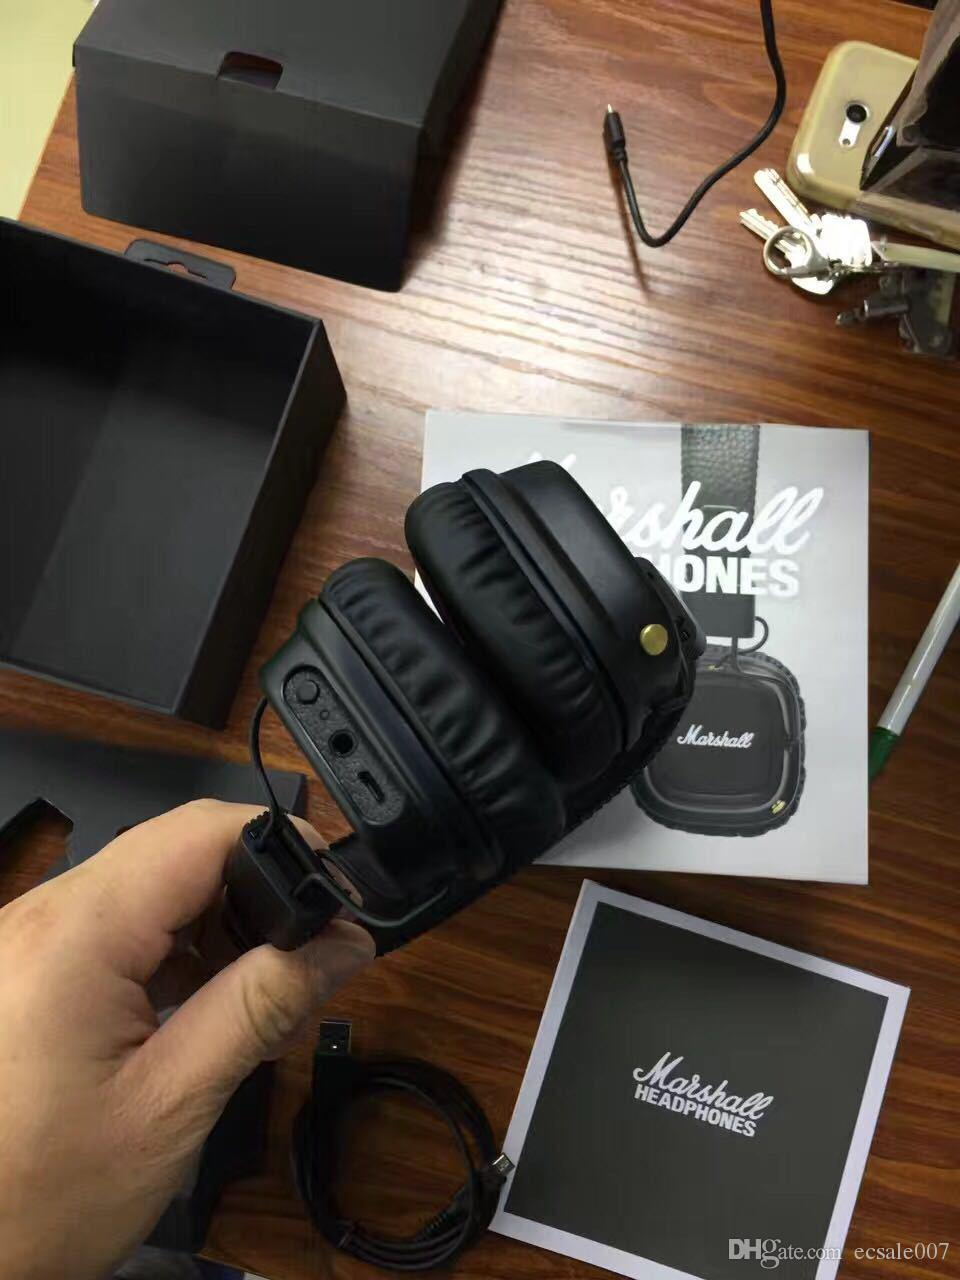 Marshall Major II 2.0 Bluetooth 무선 헤드폰 무선 마샬 메이저 II 헤드셋 DJ 헤드폰 스튜디오 헤드폰